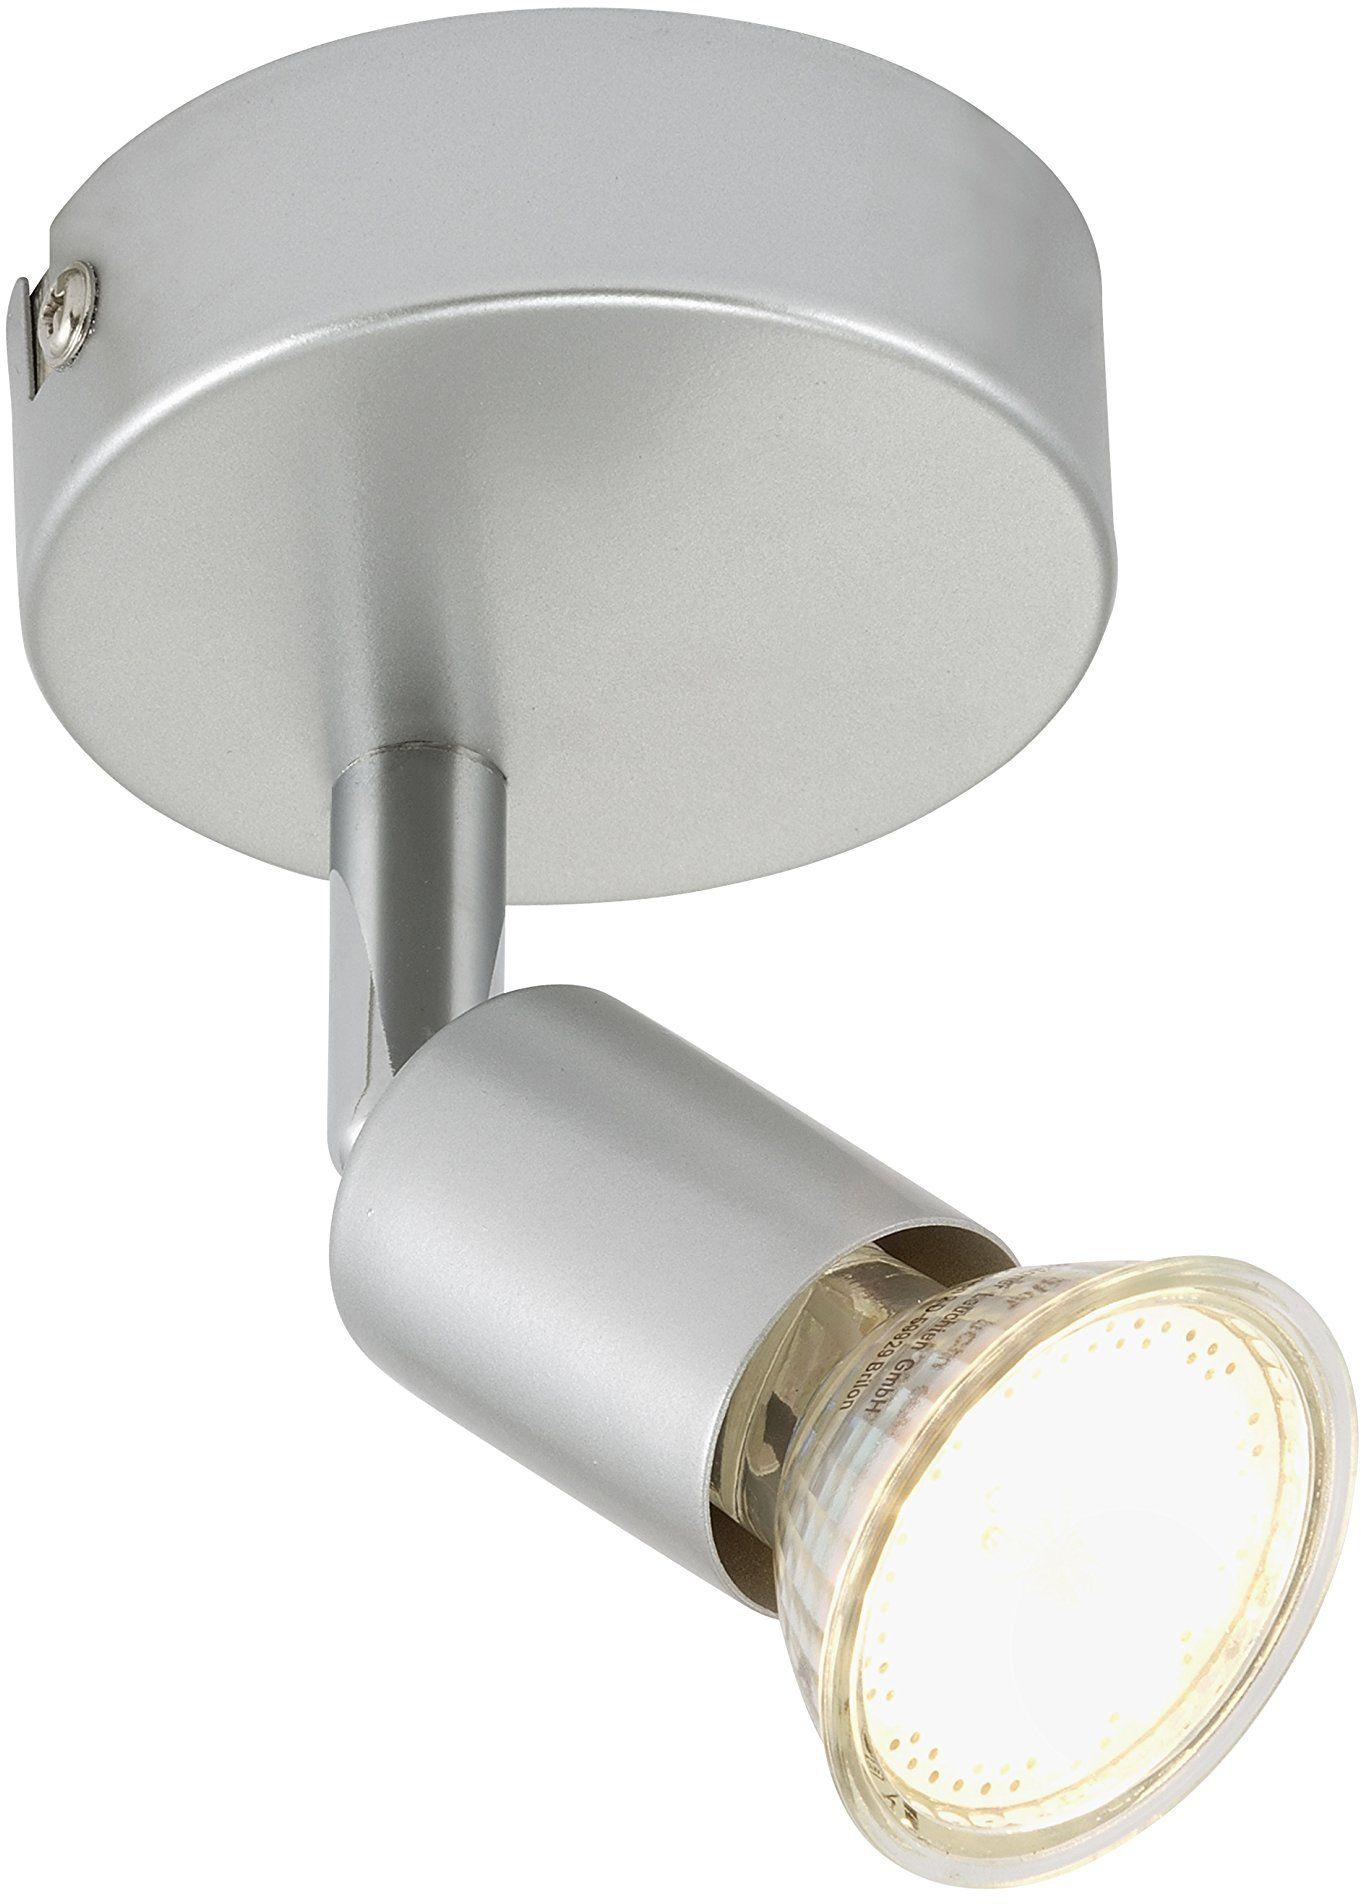 Briloner Leuchten Lampa sufitowa, reflektor ścienny, lampa LED, lampa sufitowa, reflektor LED, lampa do salonu, lampa sufitowa, lampa sufitowa, lampa ścienna, wychylna